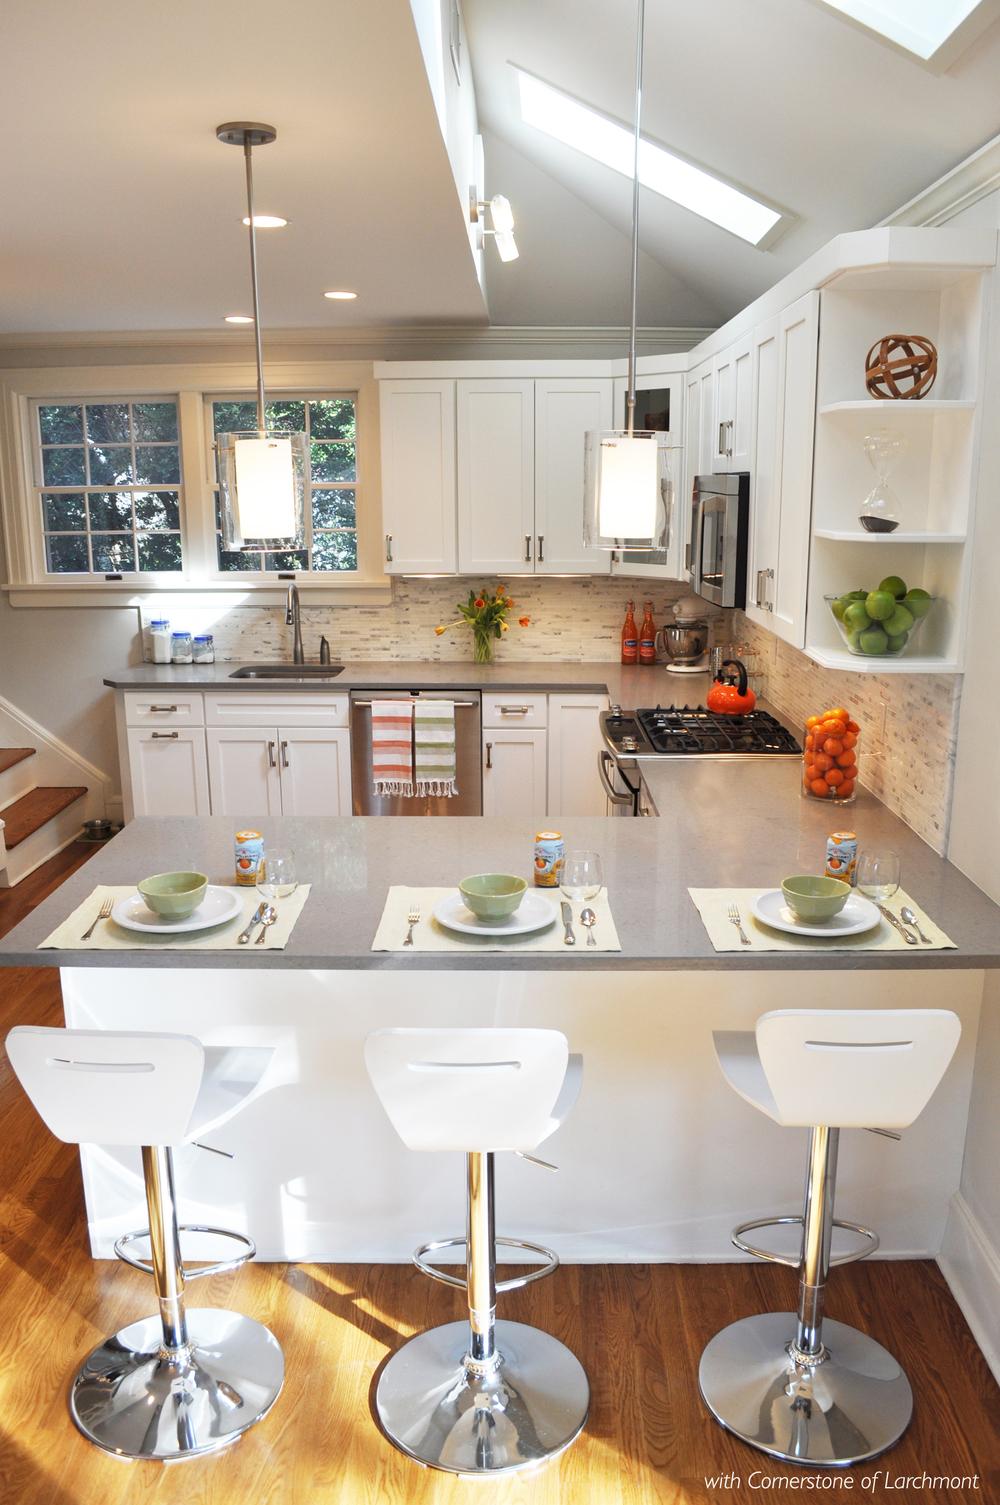 KAM DESIGN LLC_Kitchen Remodel_White Cabinets_Peninsula_Glass Pendants_Caesarstone.jpg